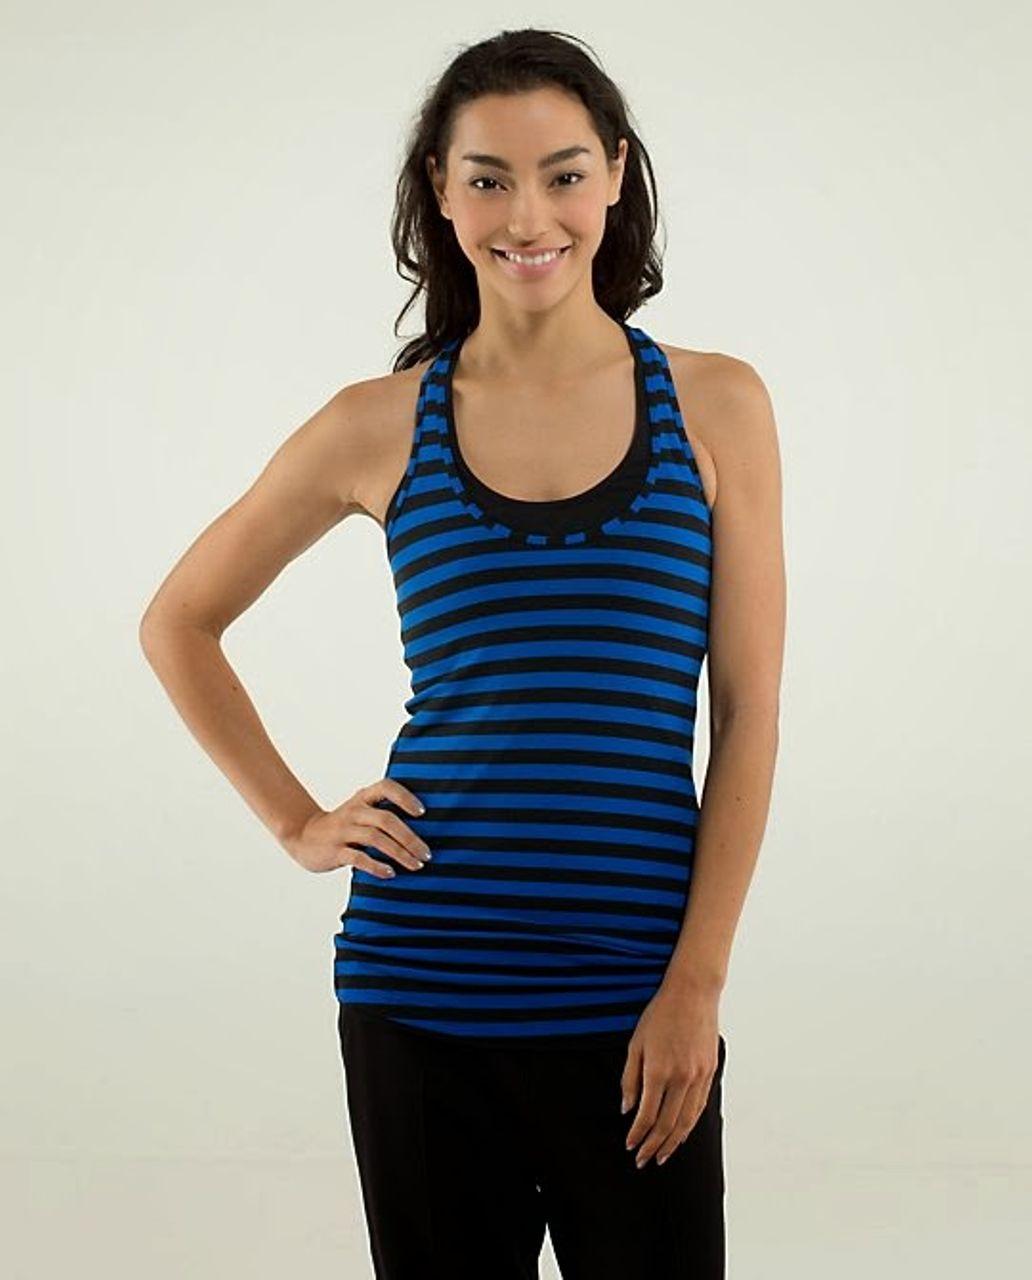 Lululemon Cool Racerback - Apex Stripe Baroque Blue